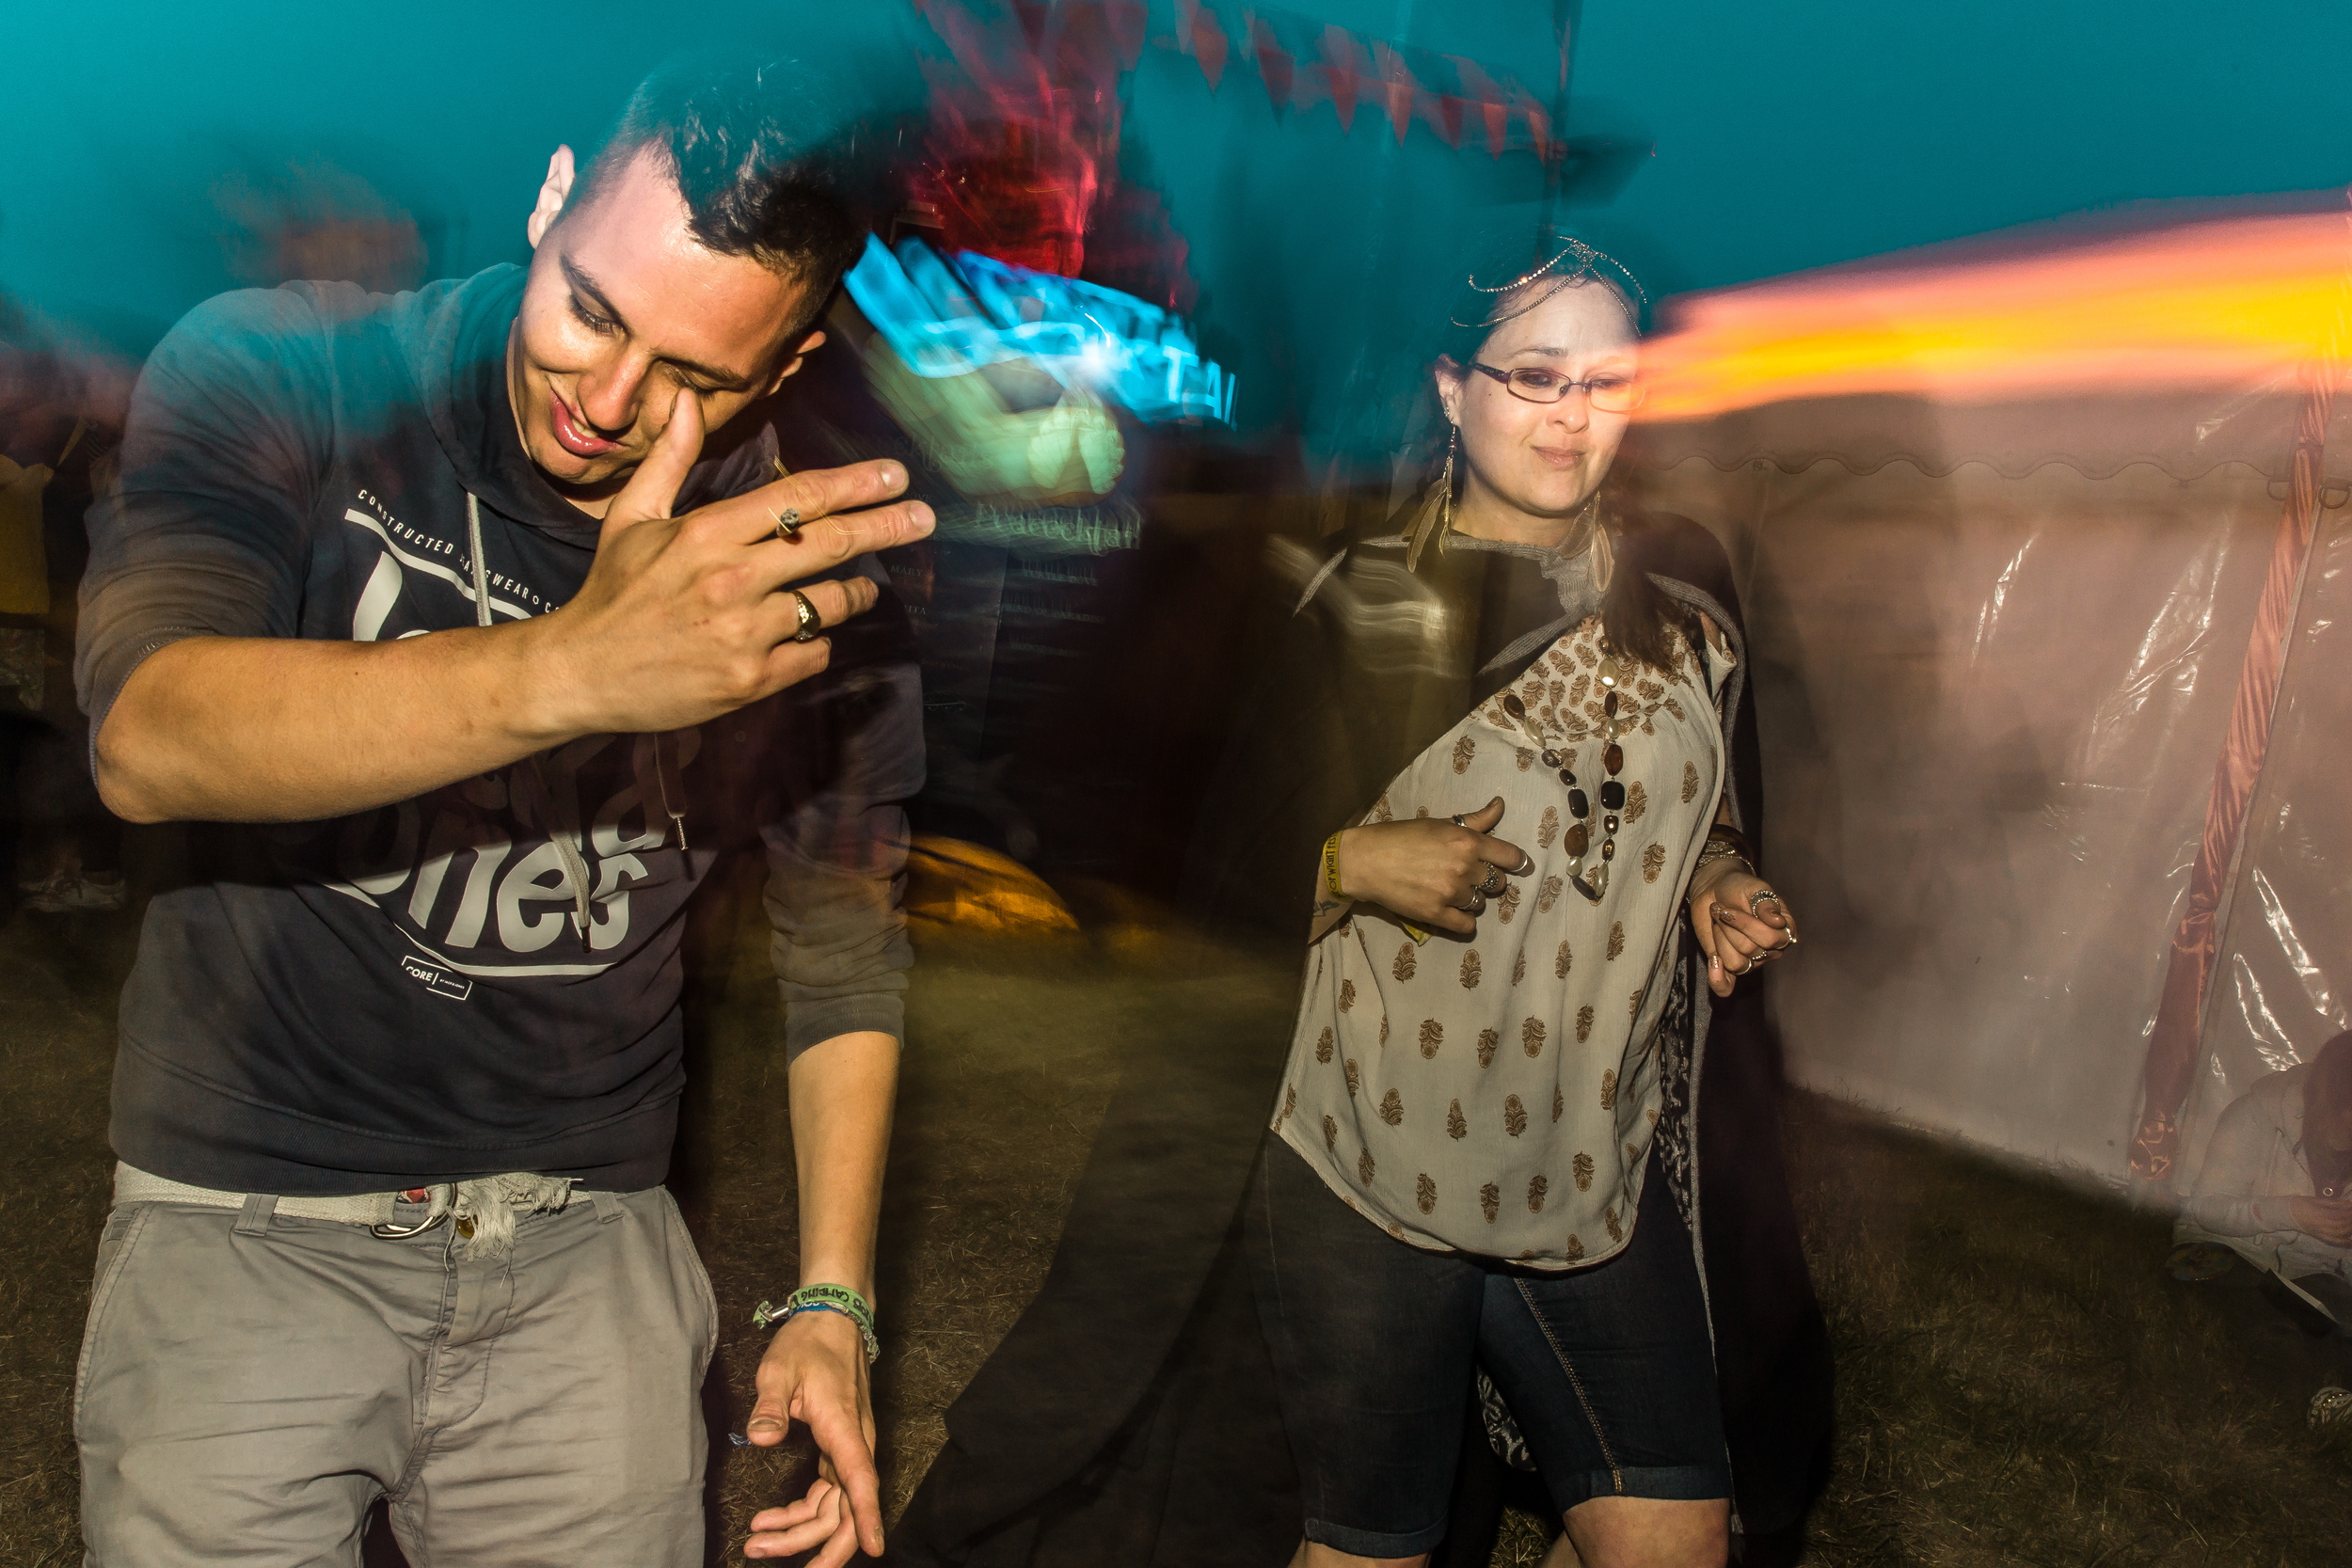 hipshaker night dancing- Shaun Forde, Emma Terraciano-2.JPG